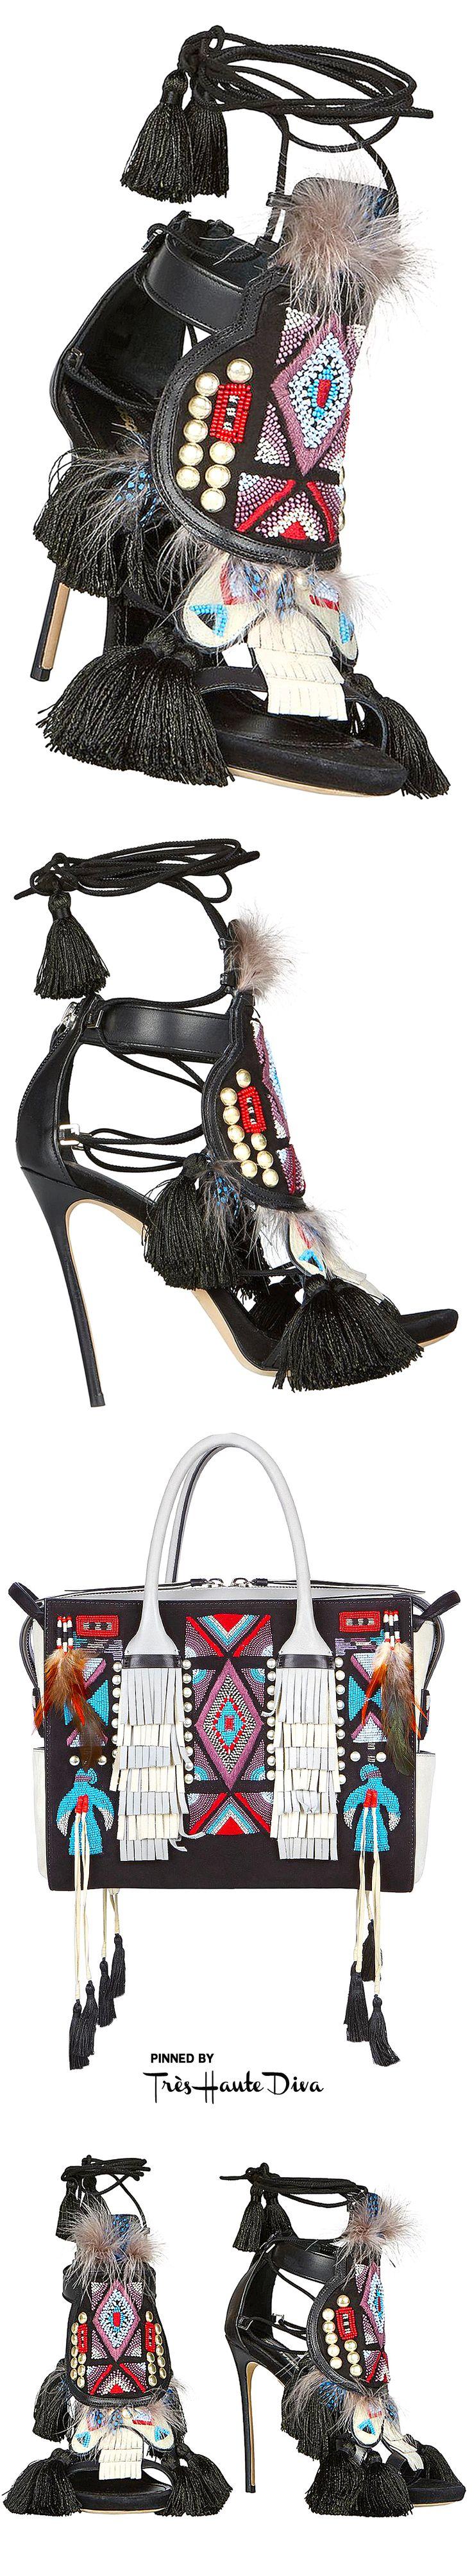 ♔Très Haute Diva♔ Dsquared2 Twin Peaks Medium Handbag and Eskimo Chic Sandals